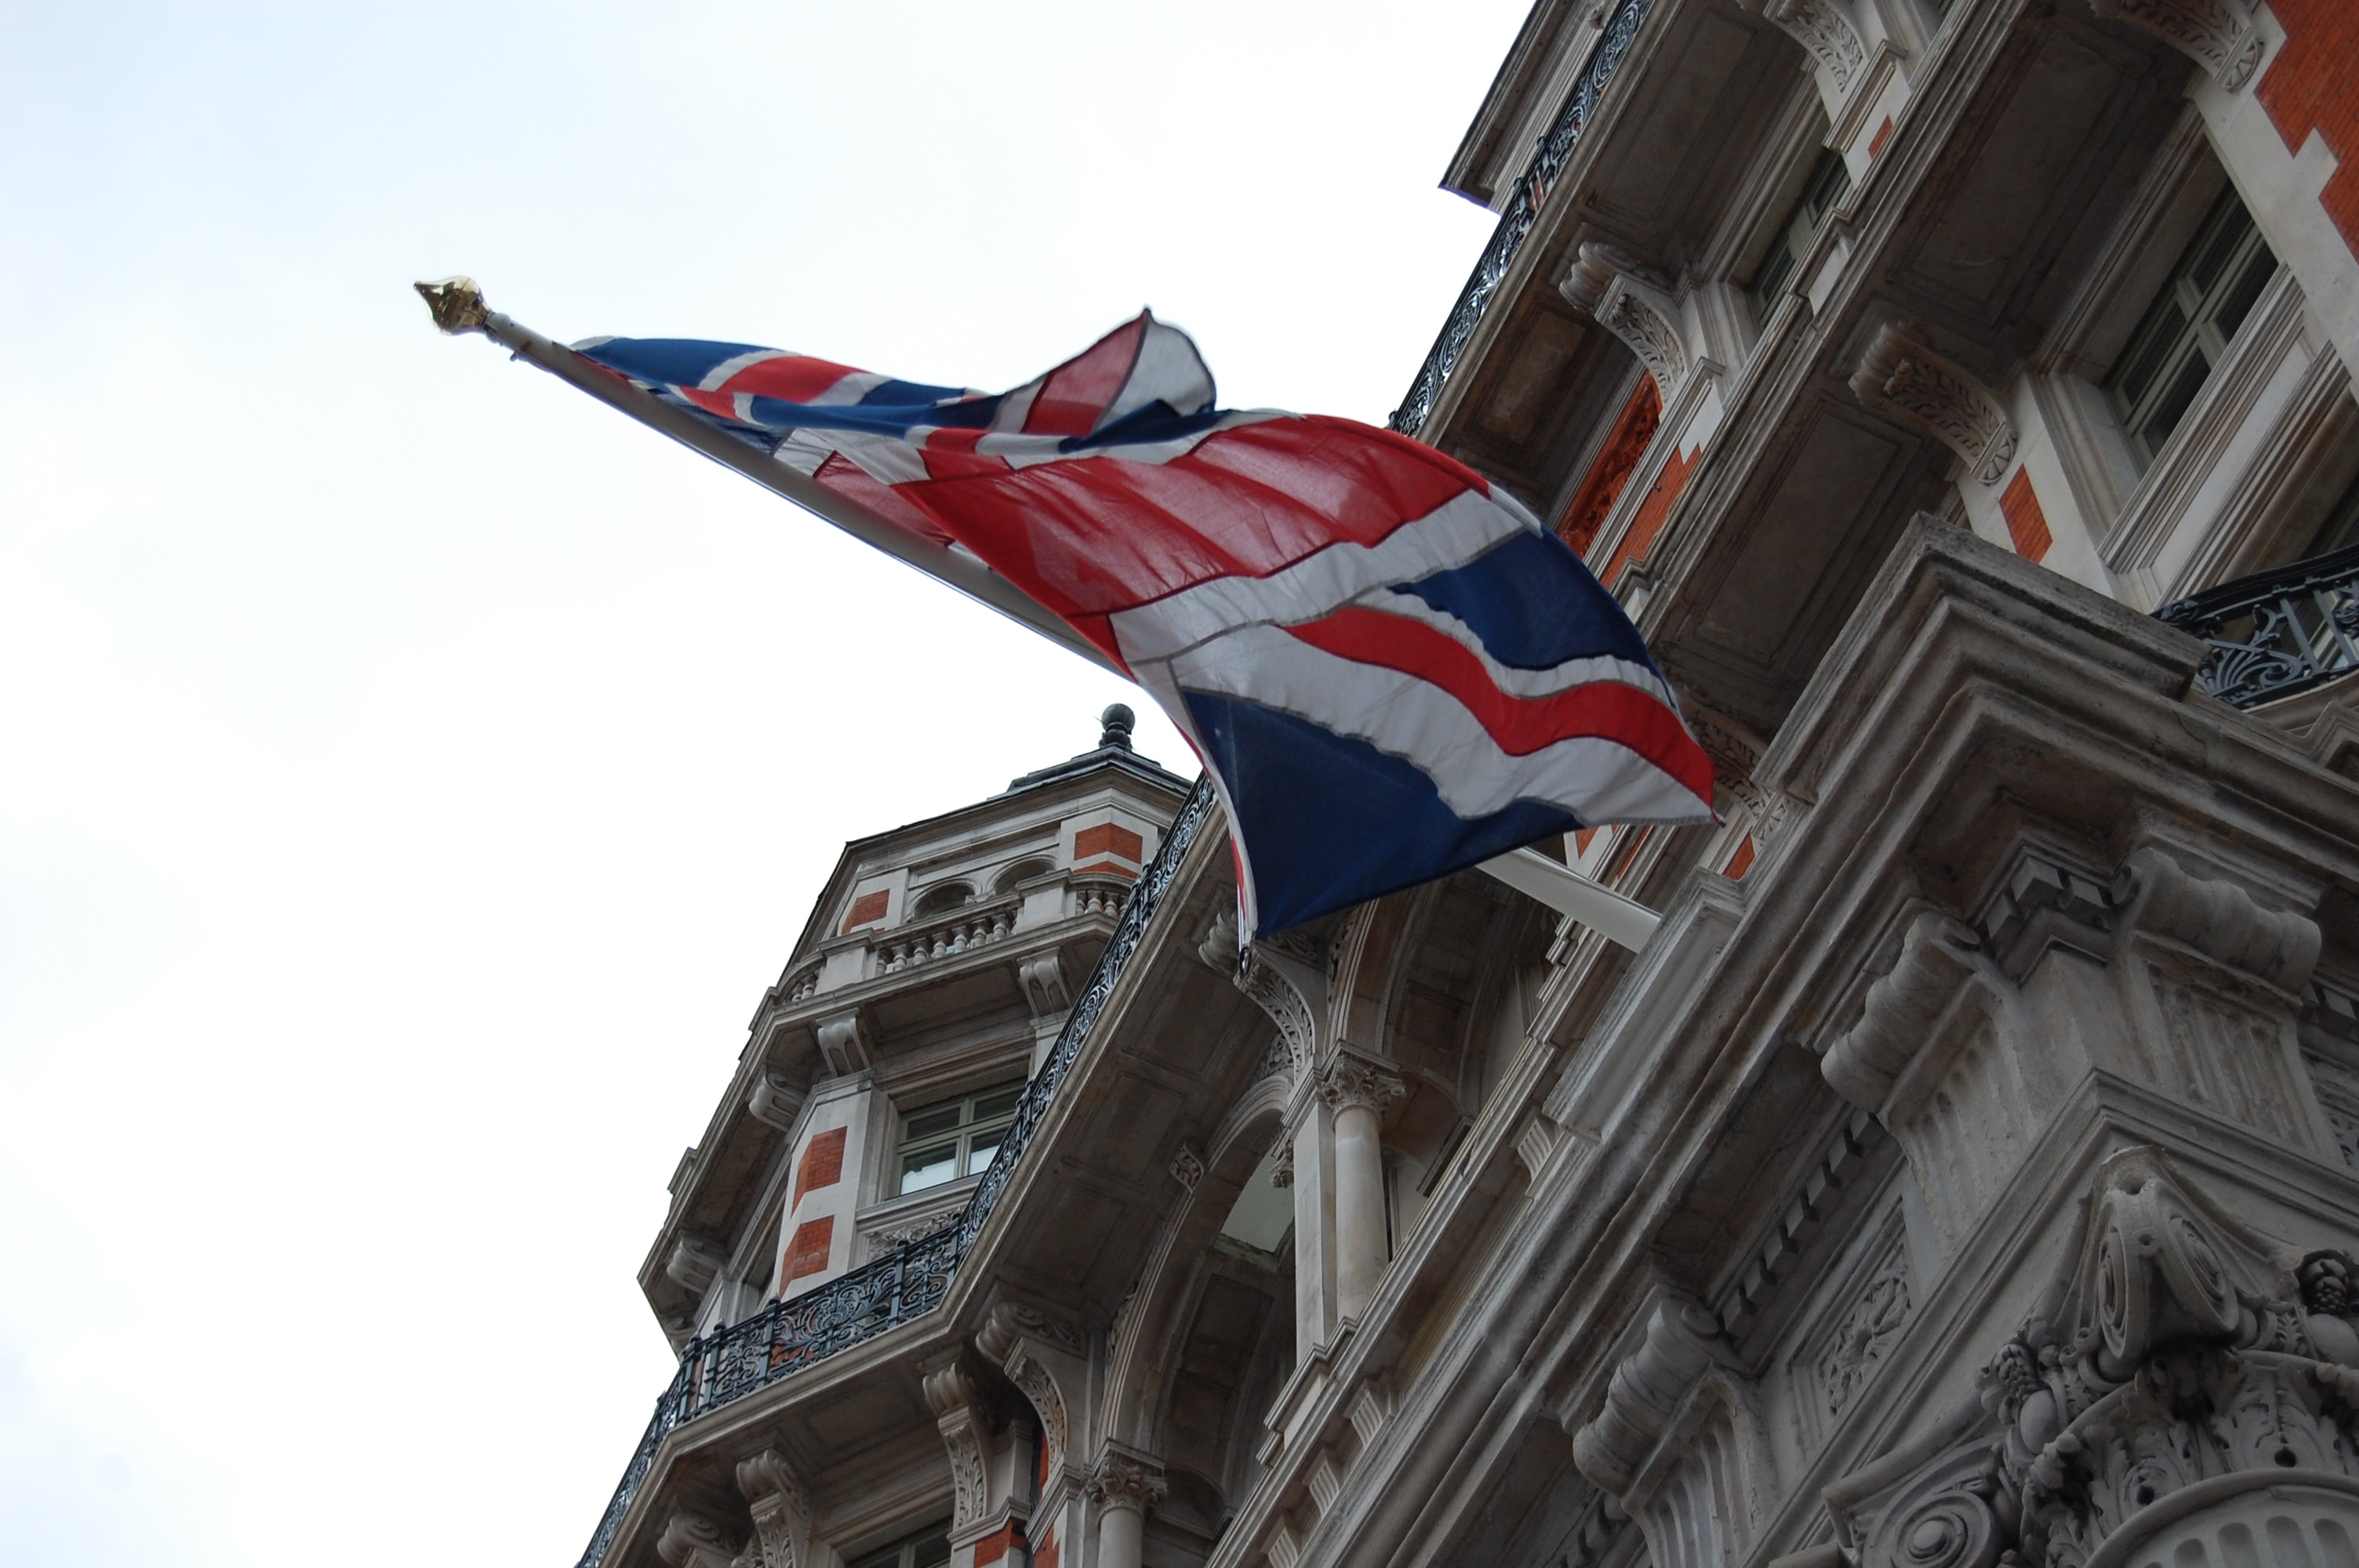 United Kingdom flag on white concrete building at daytime